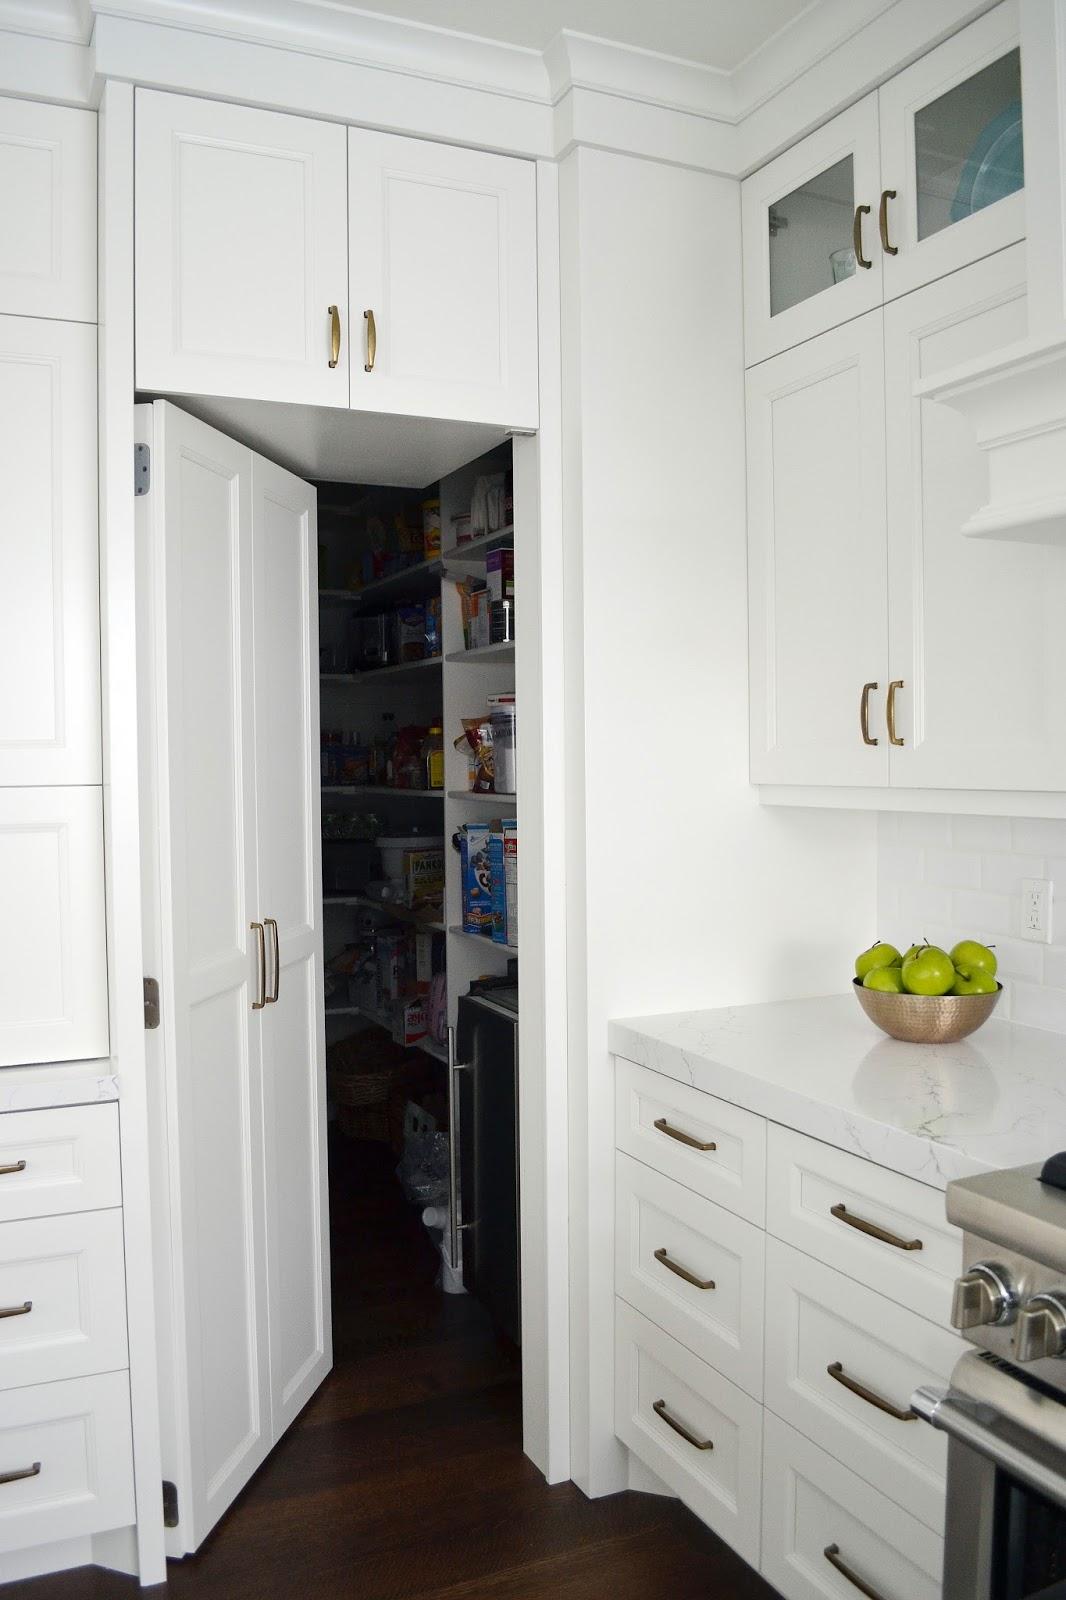 Sita Montgomery Interiors: The Primrose Project Kitchen Reveal ...